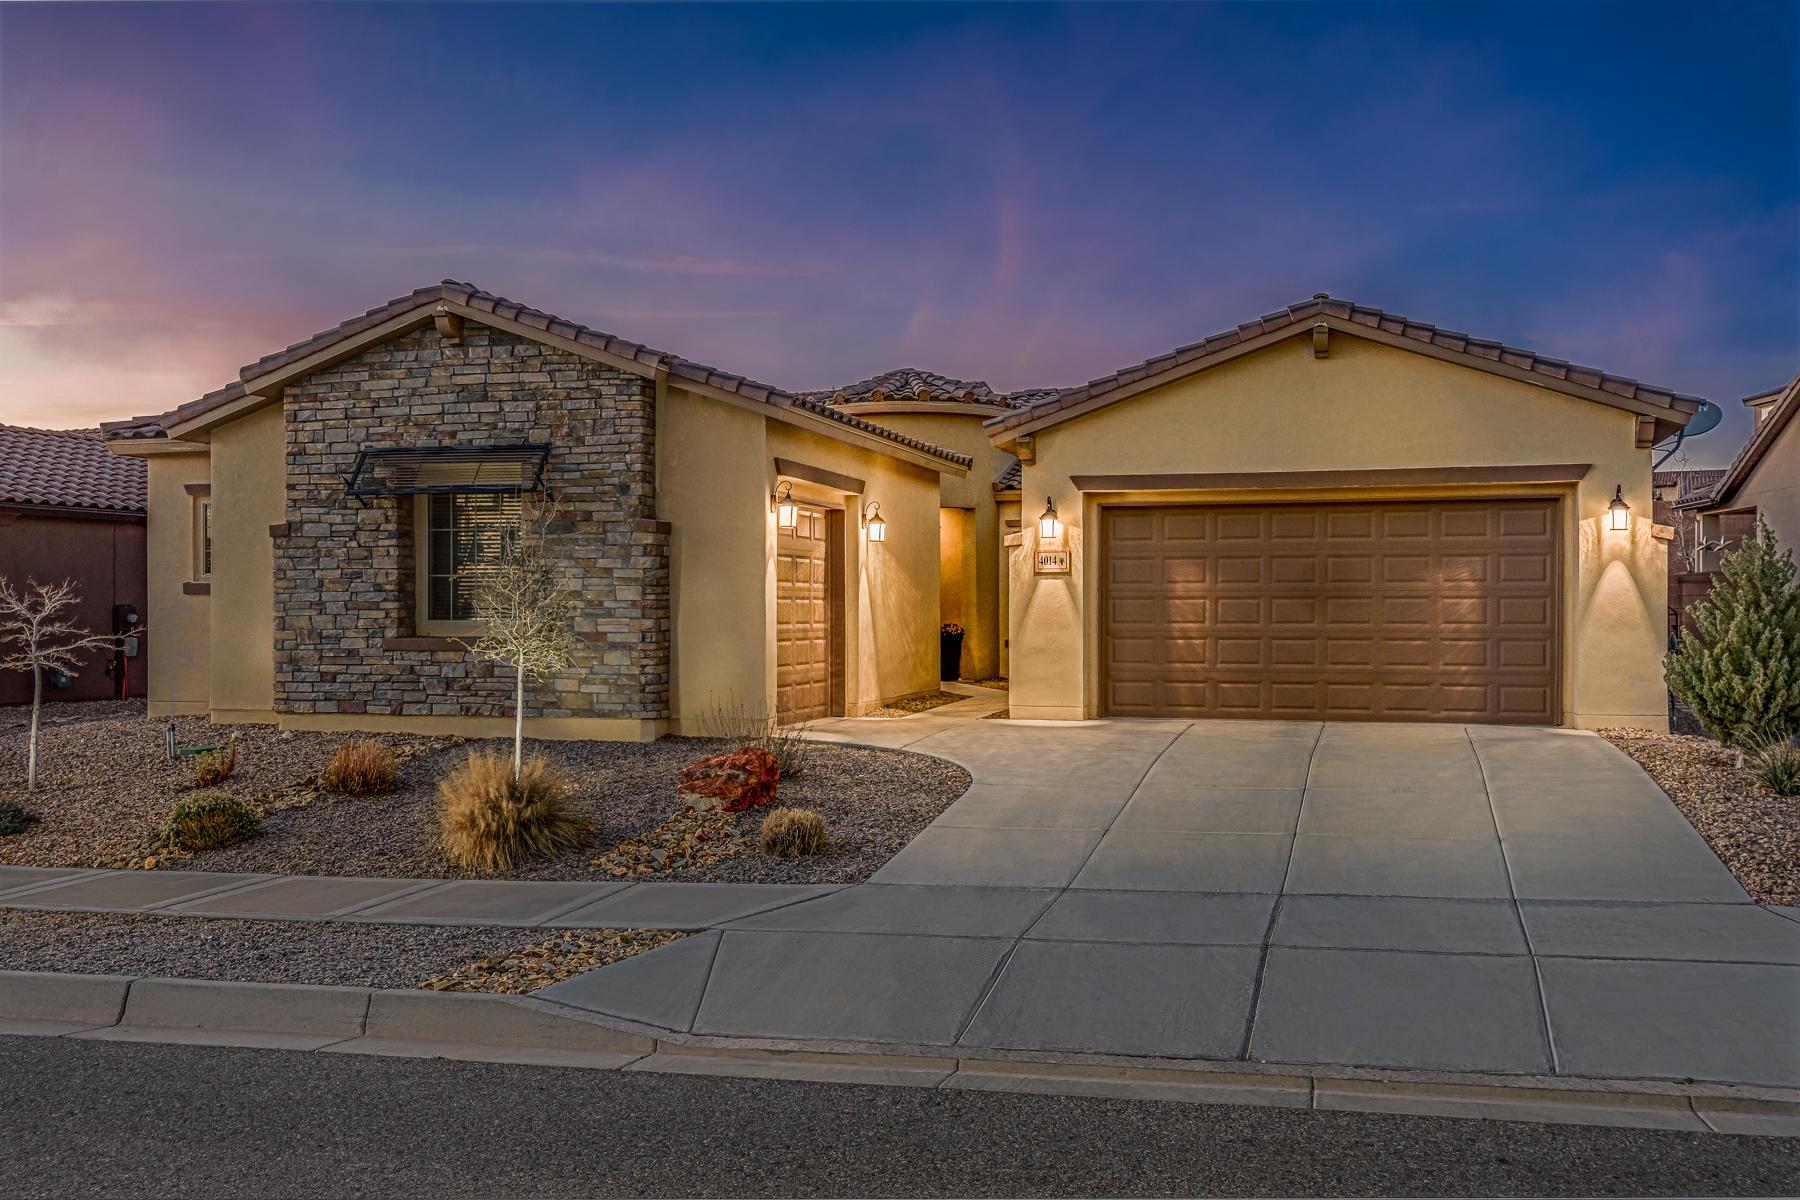 4014 PLAZA COLINA Lane NE, Rio Rancho, NM 87124 - Rio Rancho, NM real estate listing